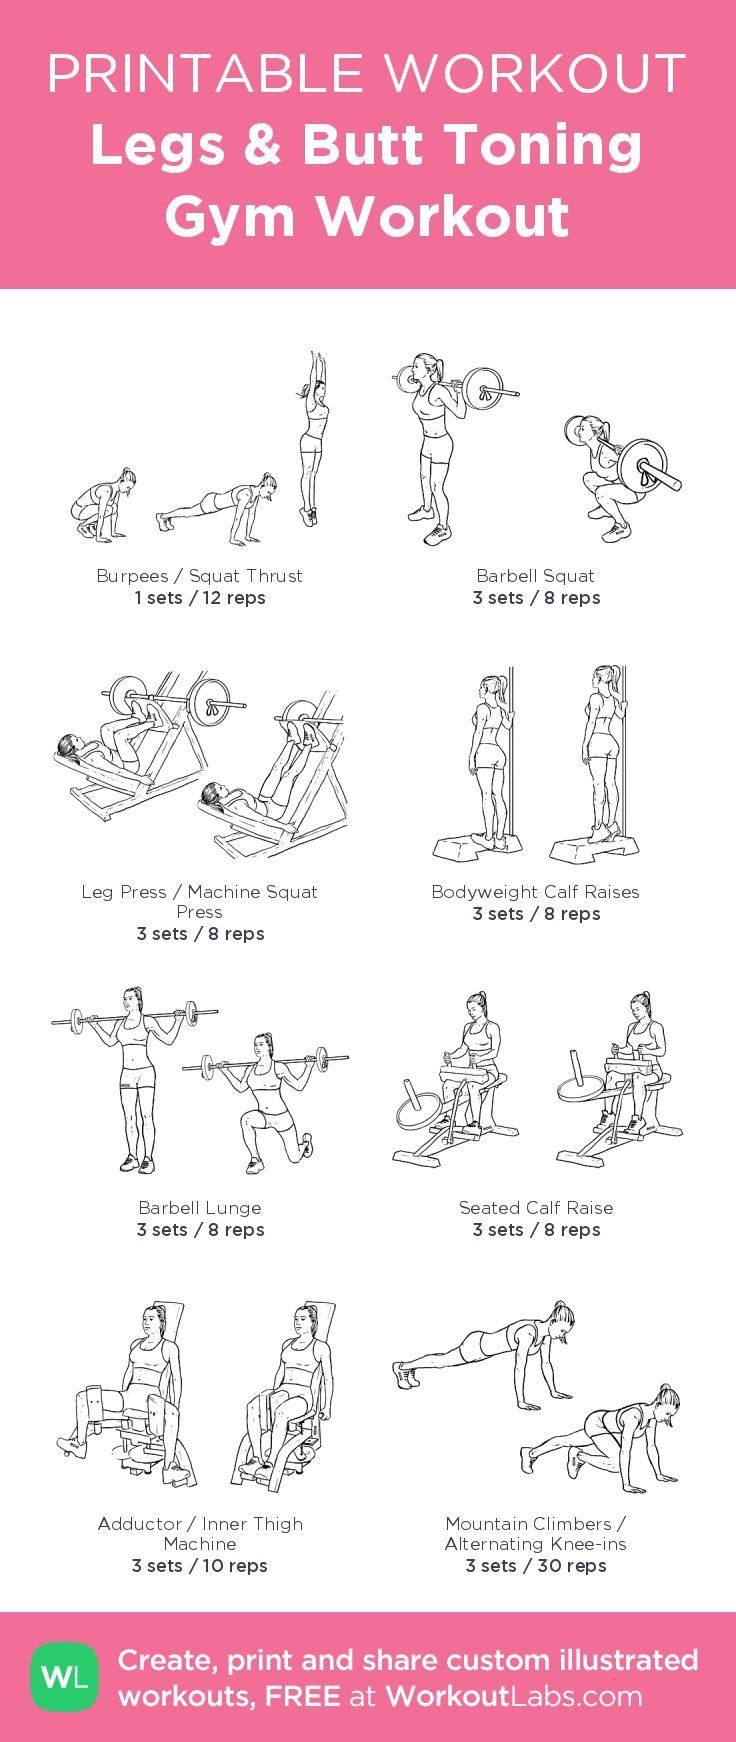 Pin by LesleyAnne on Workout Gym workouts, Workout plan